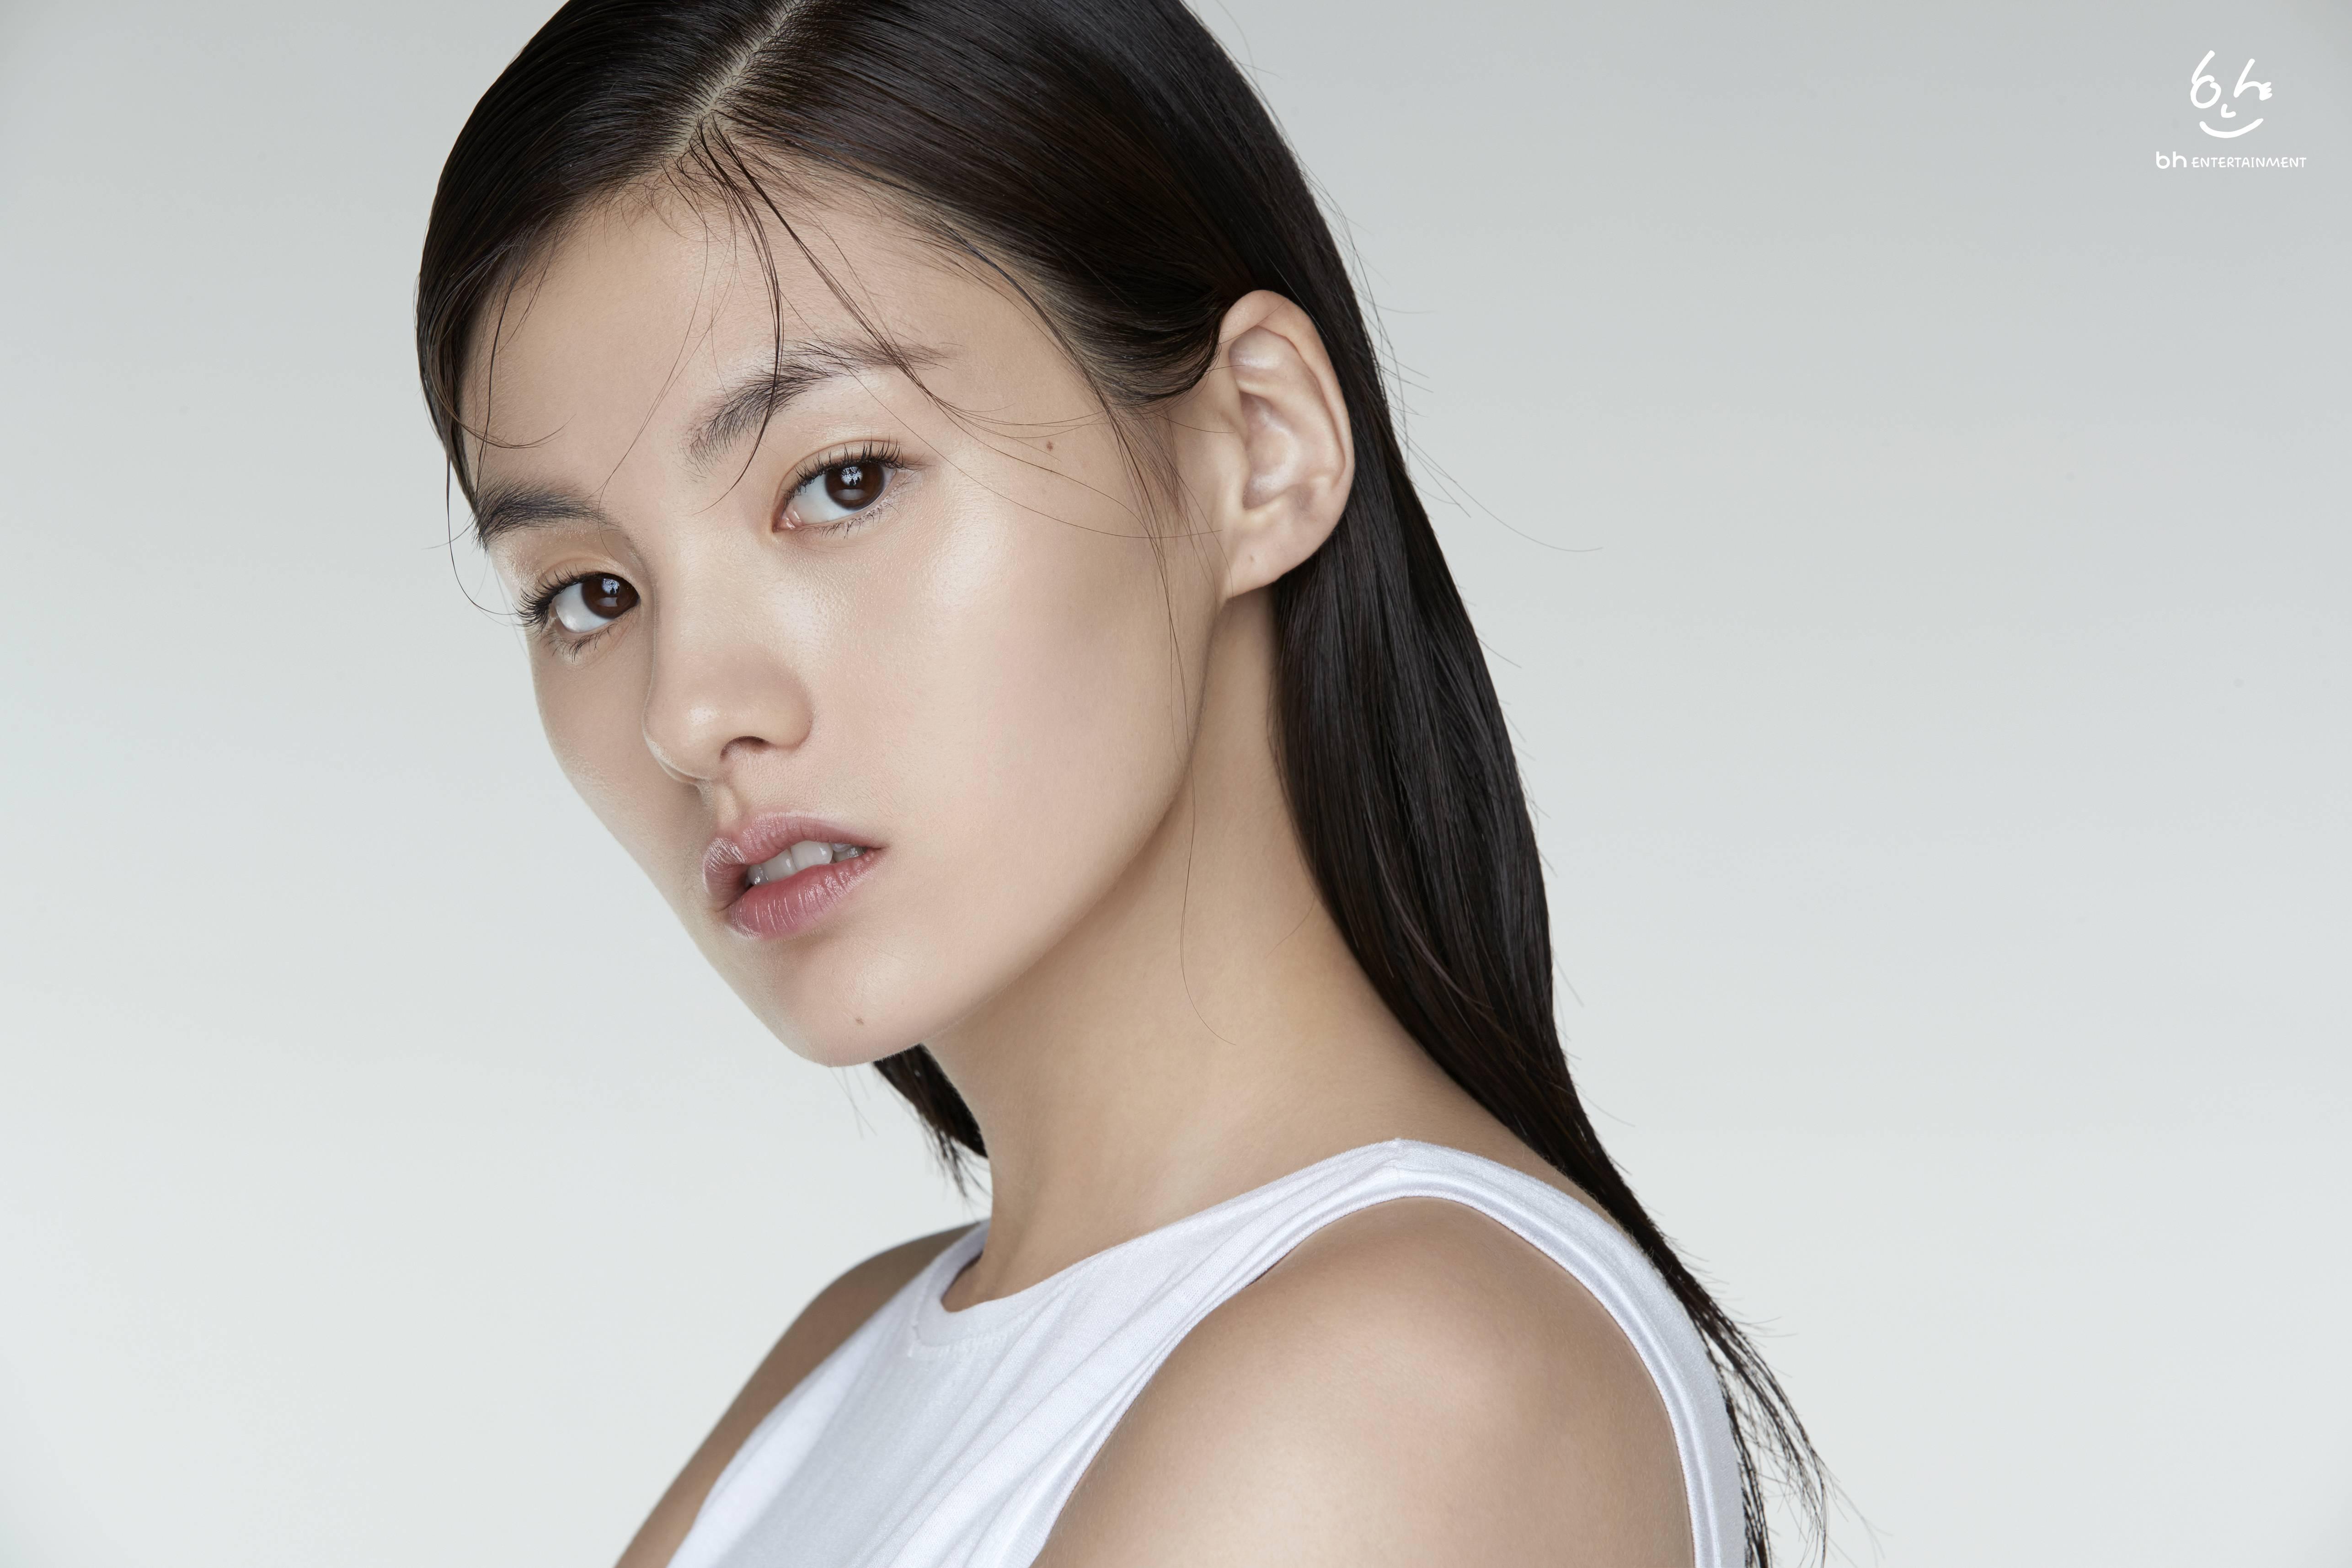 Kim Yong-ji | Korean celebrities, Actresses, Model